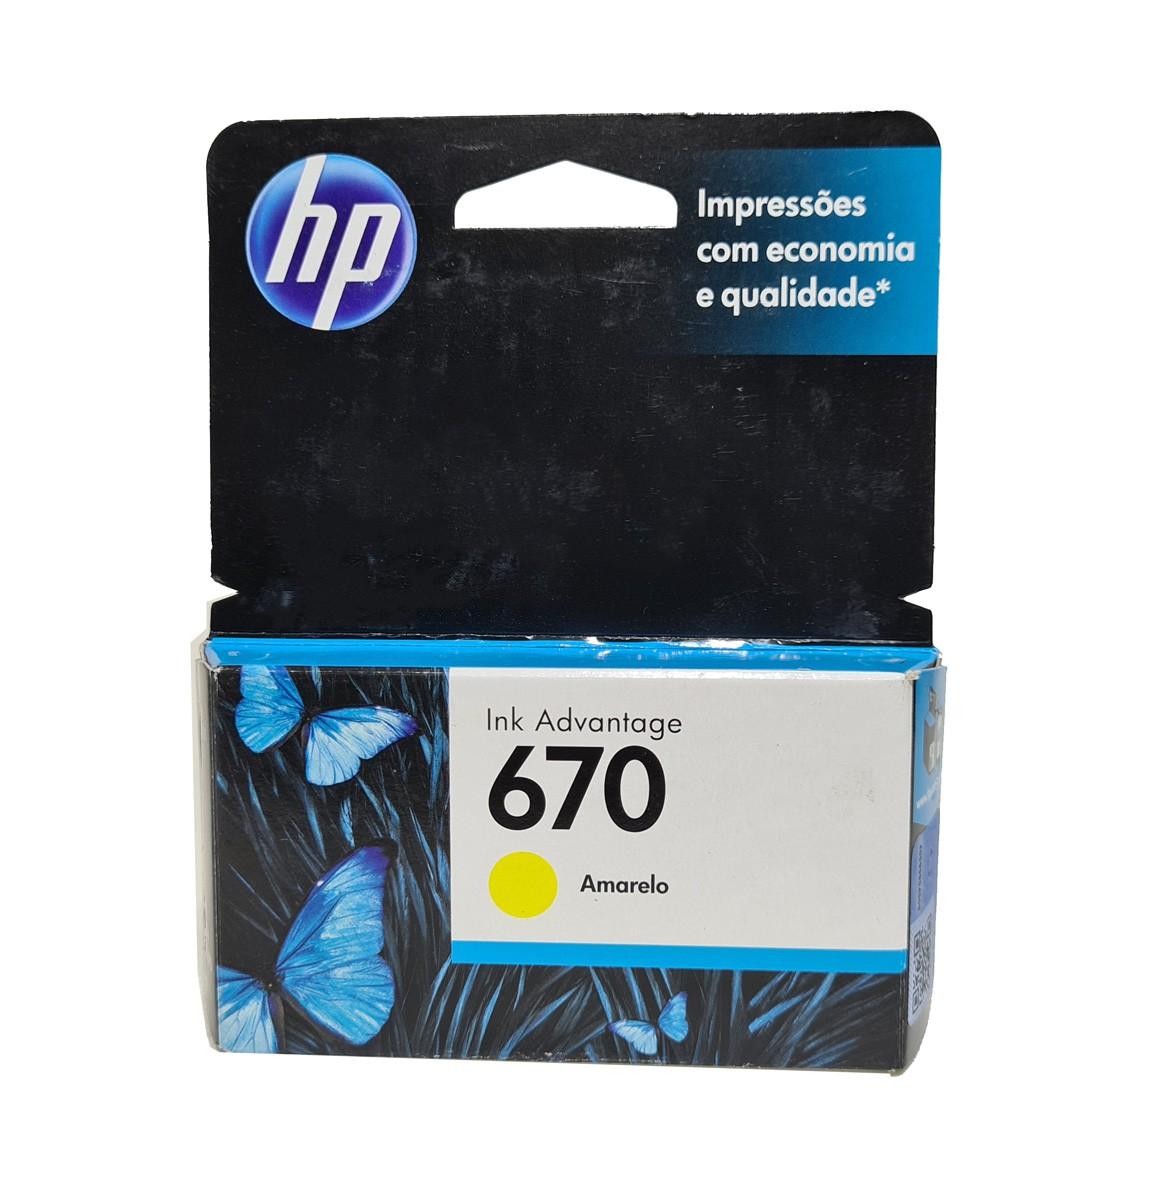 Cartucho HP 670 CZ116AB 3.5ml Amarelo para 3525 4615 4625 5525